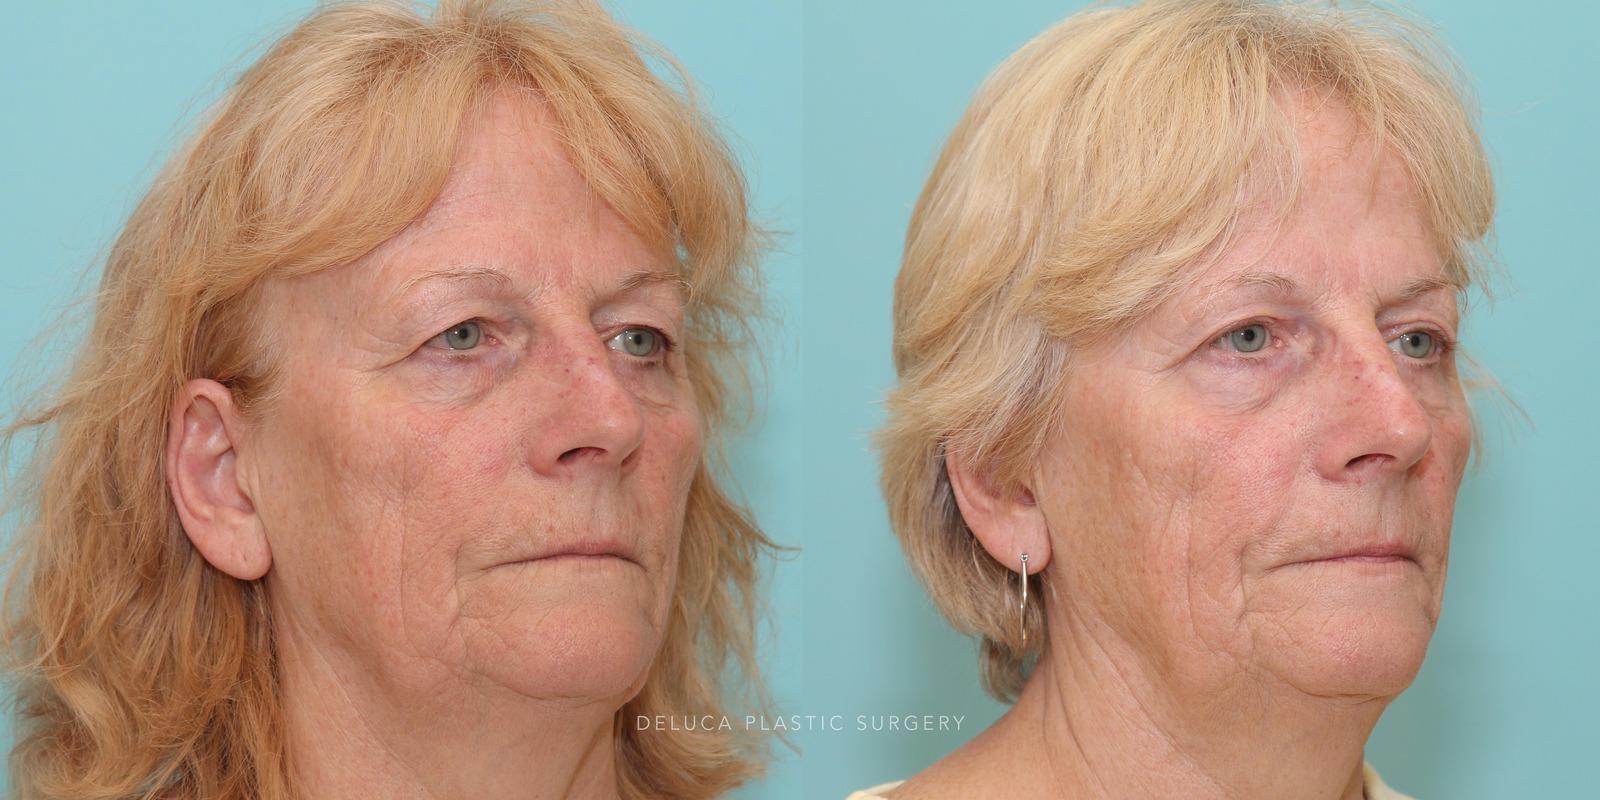 69 year old Upper Eyelid Blepharoplasty